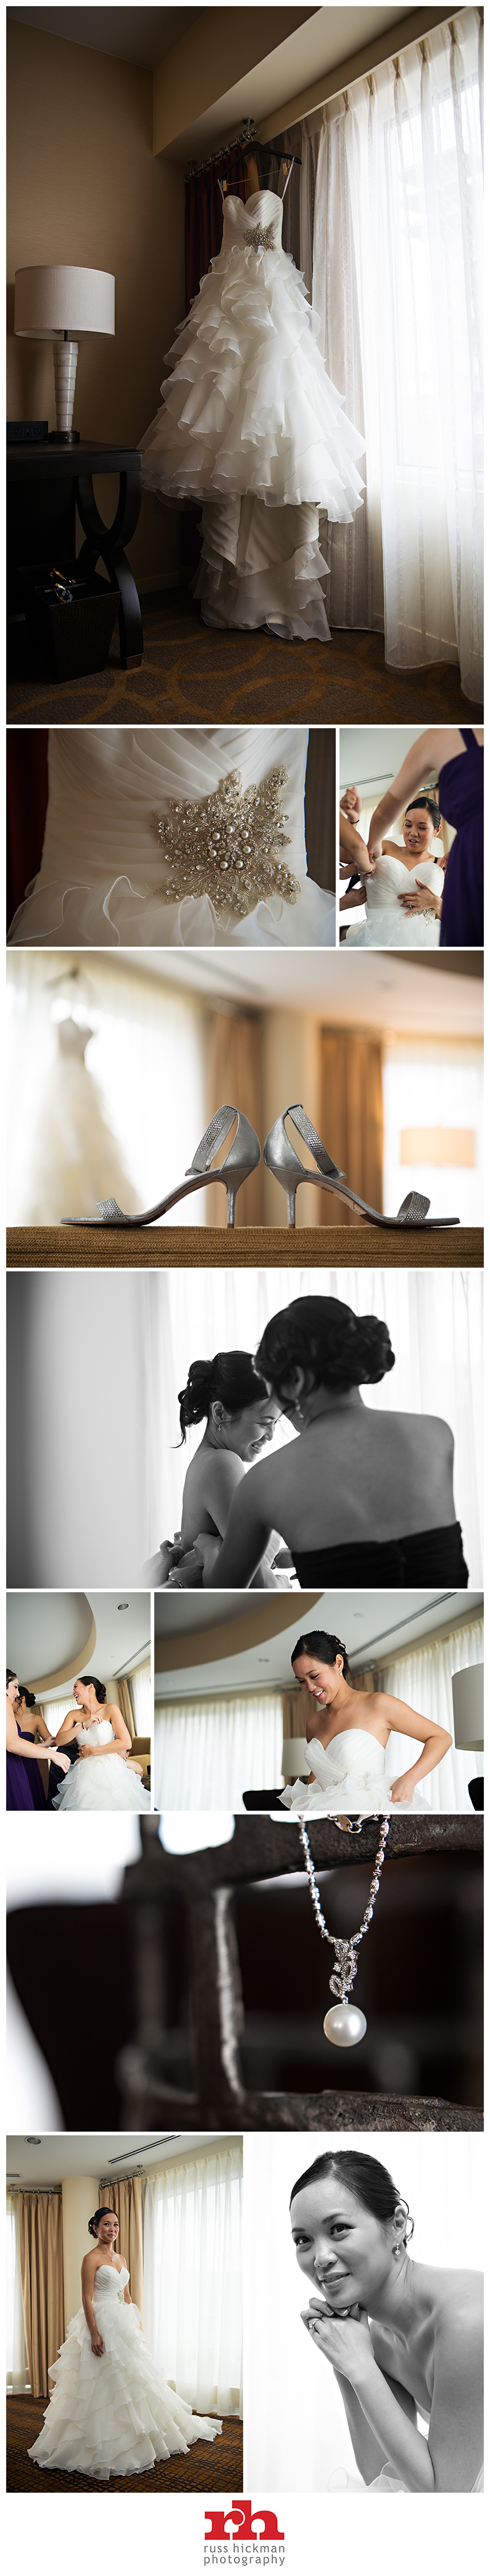 Philadelphia Wedding Photographer EMWB0002